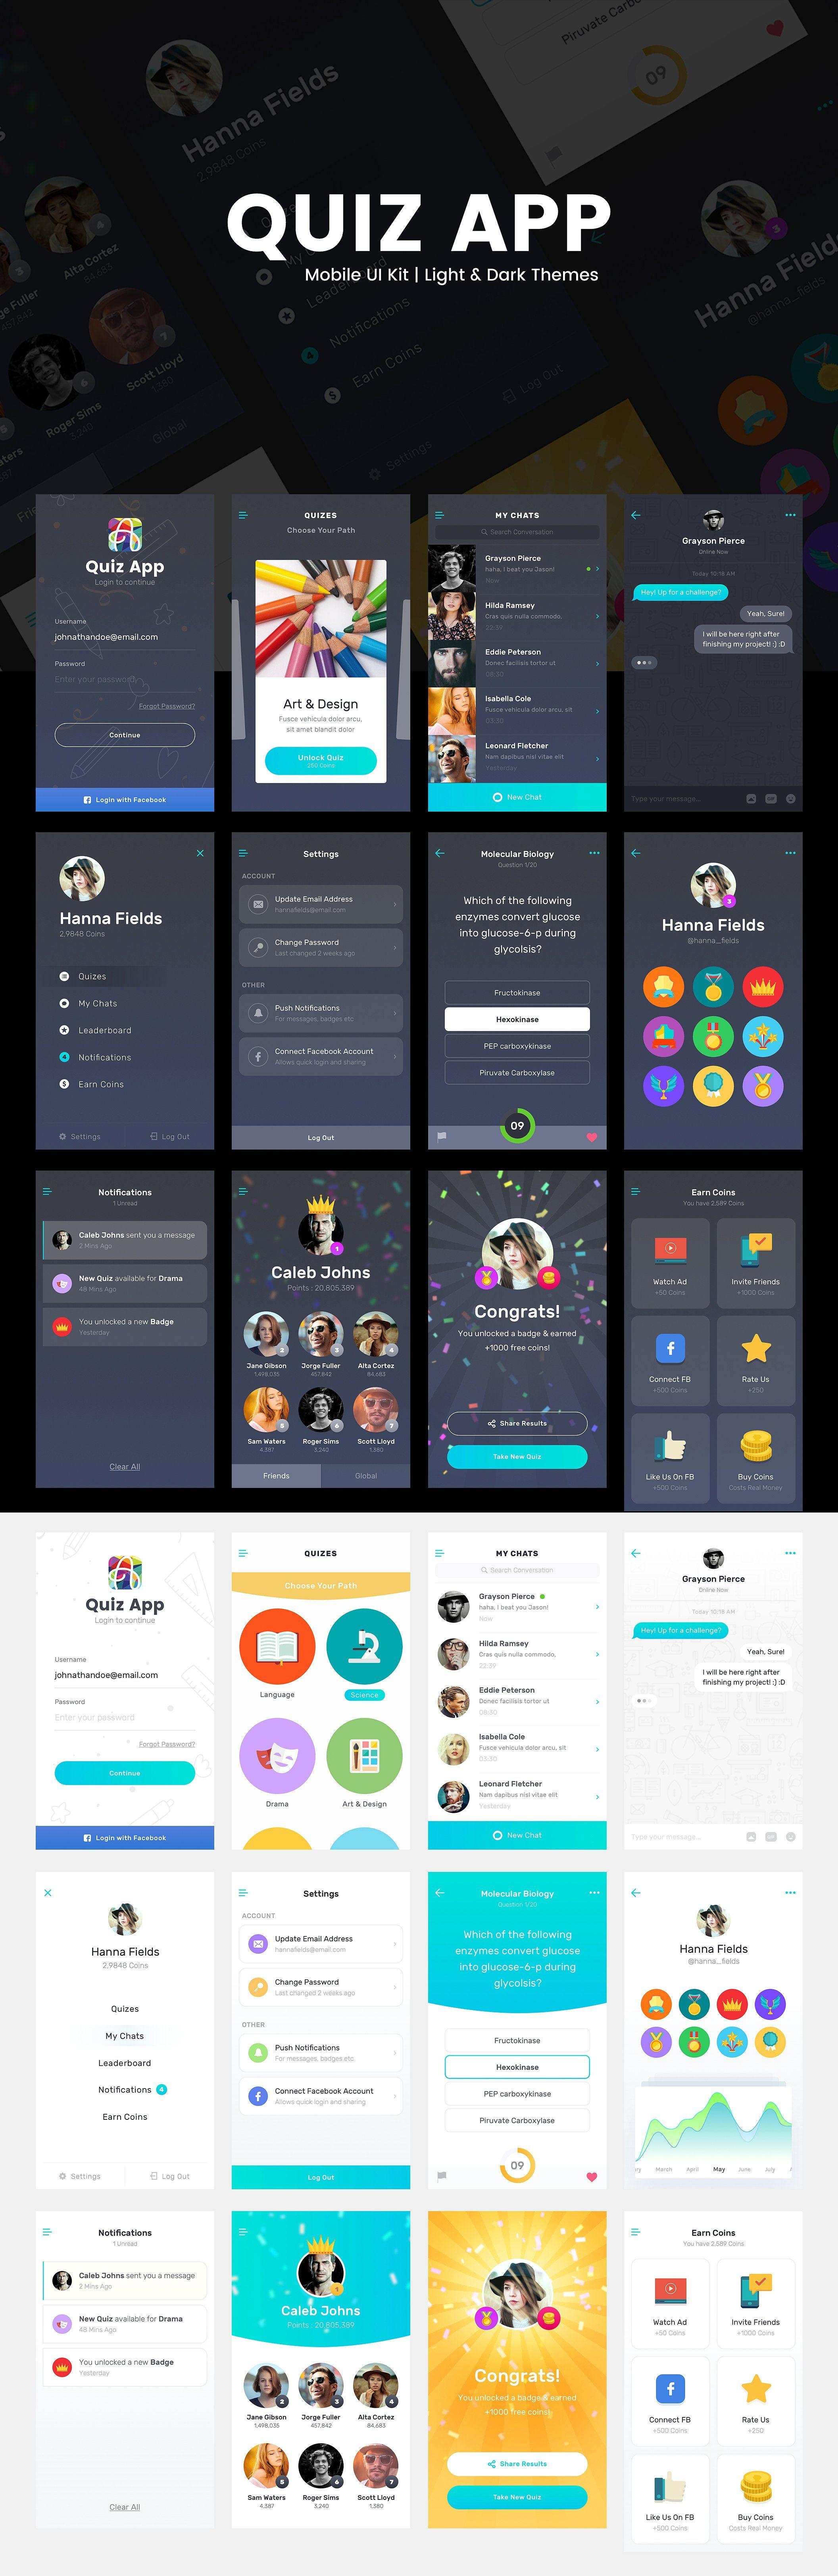 Quiz App - Mobile Trivia Game UI Kit by Nimart on